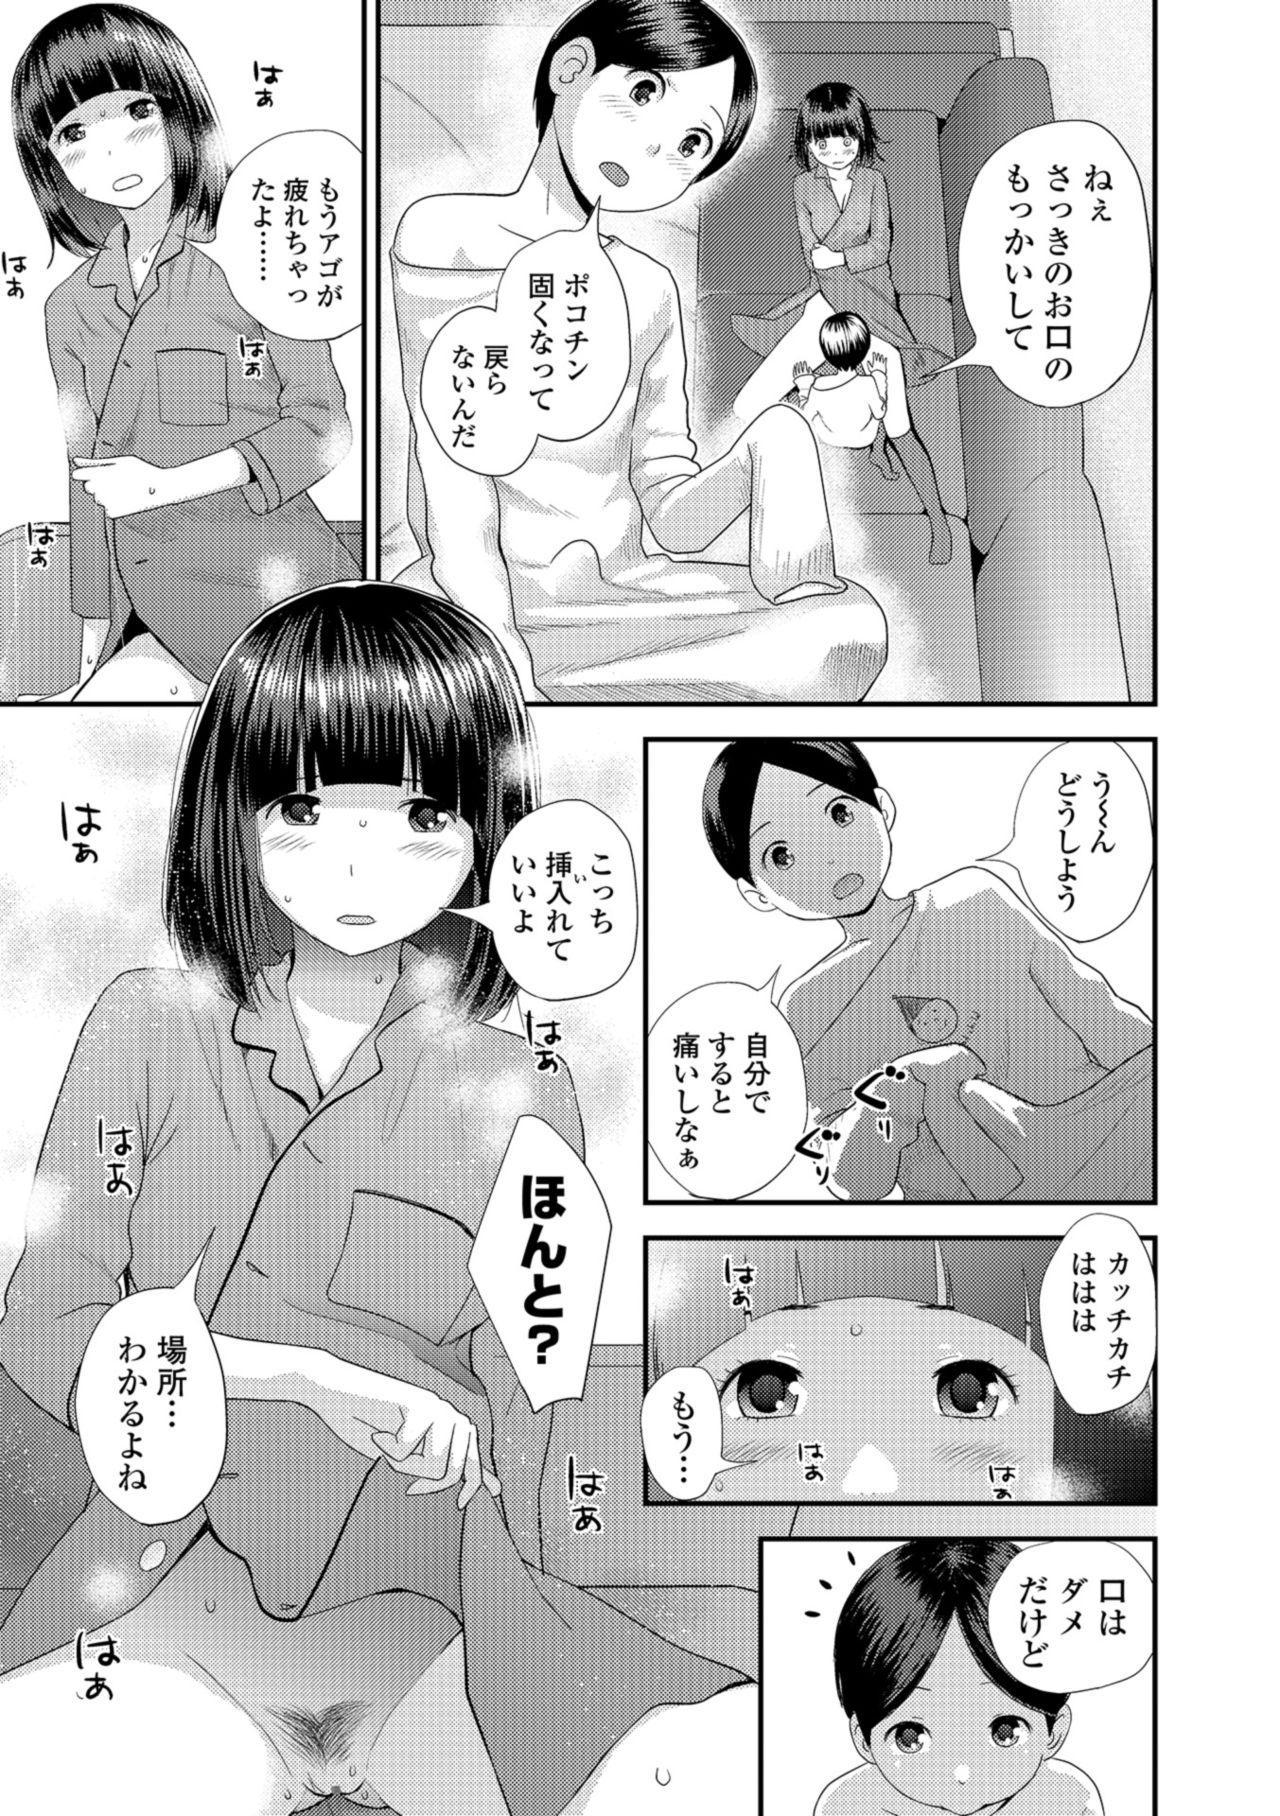 COMIC Shigekiteki SQUIRT!! Vol. 09 92